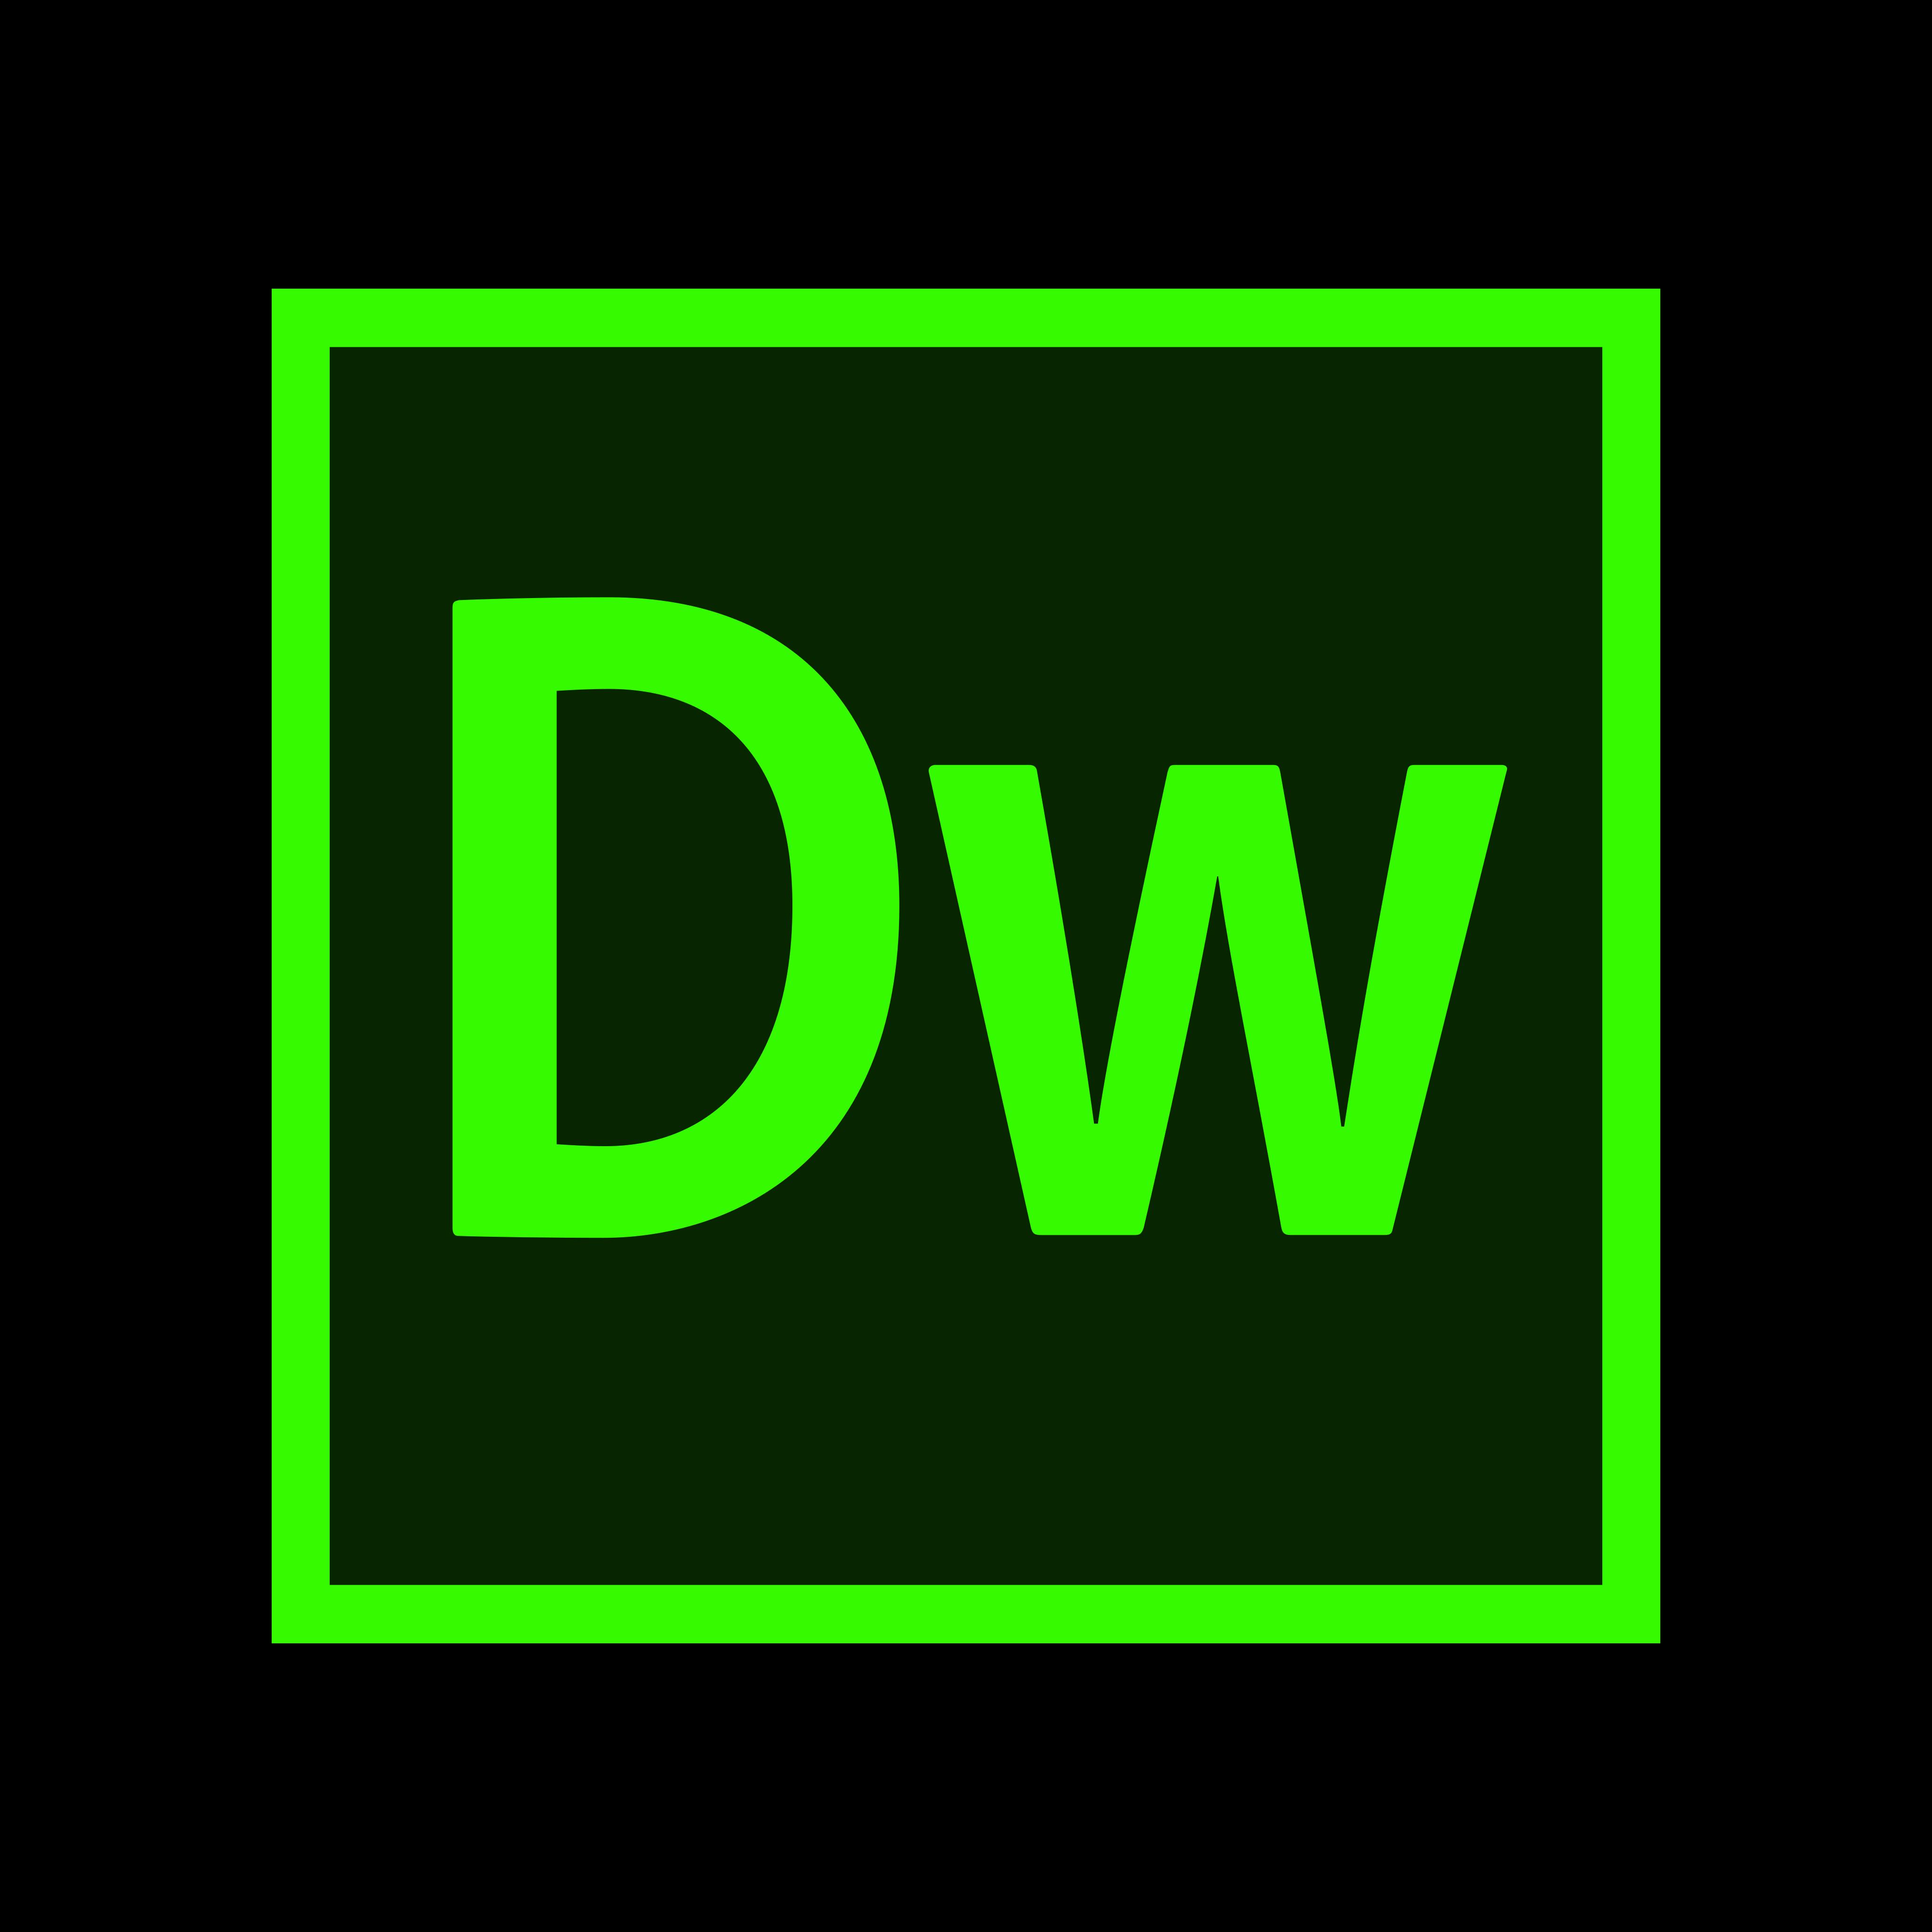 adobe dreamweaver logo 0 - Adobe Dreamweaver Logo